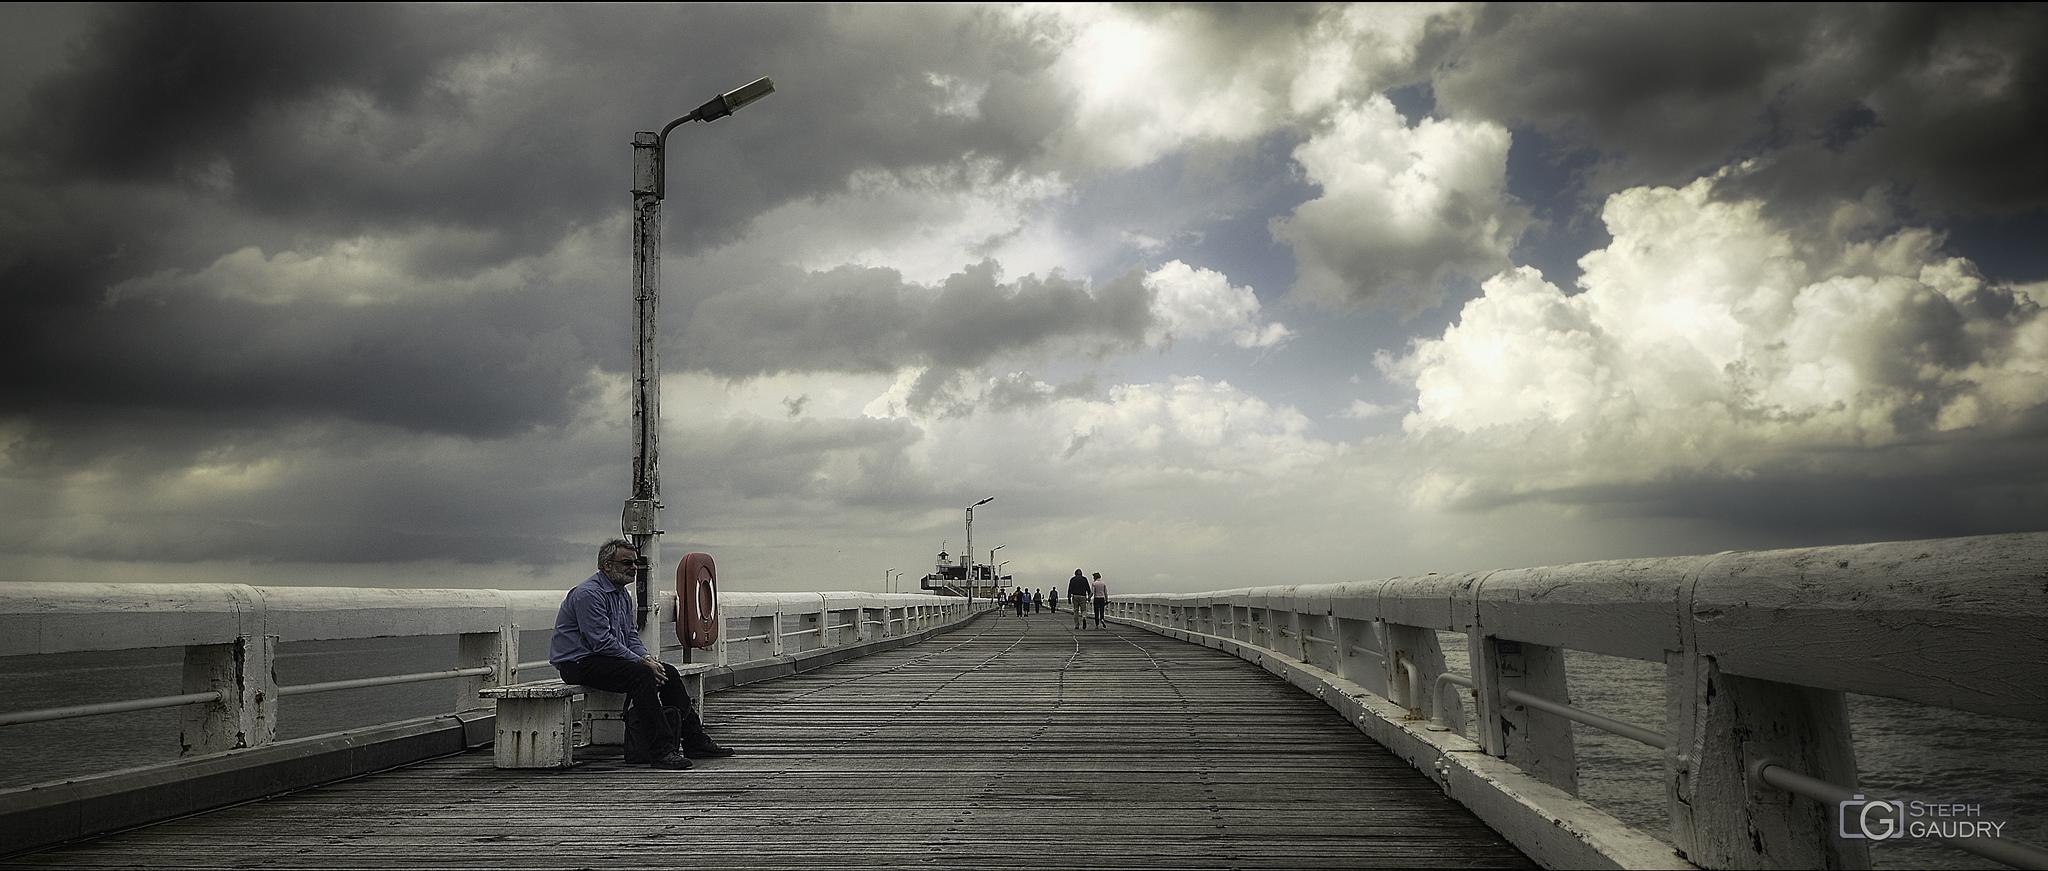 L'estacade d'Ostende